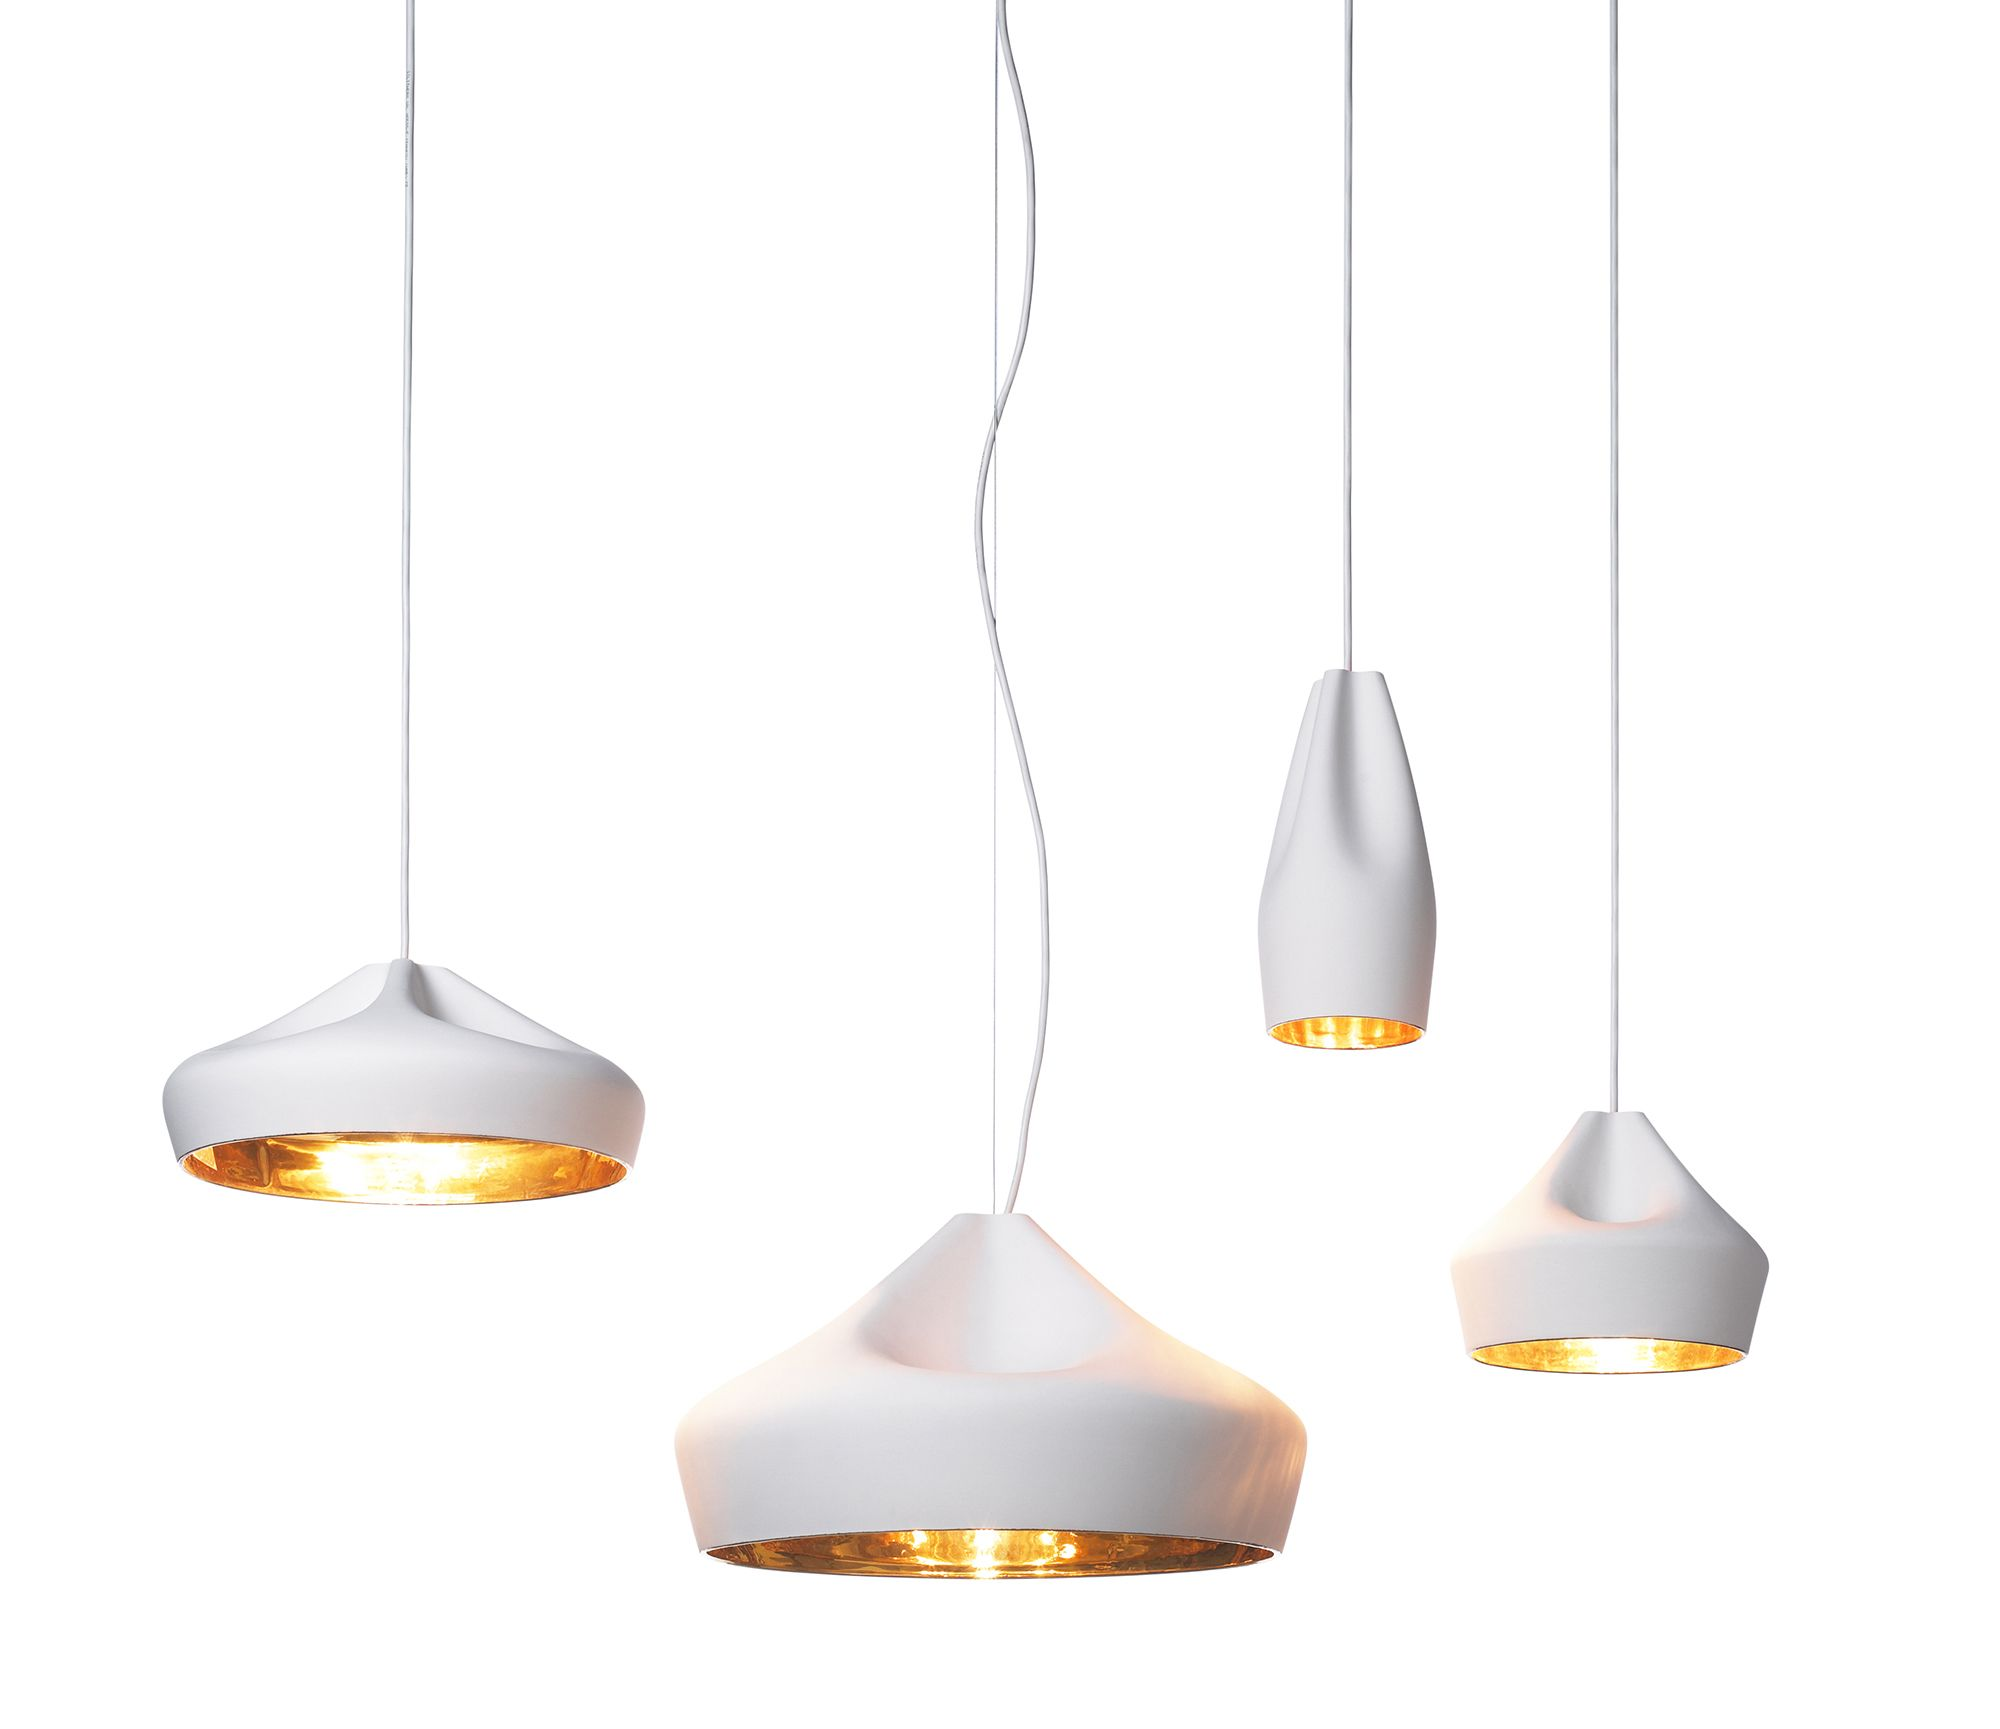 Suspension light - Marset | burrus // project ideas | Pinterest ...